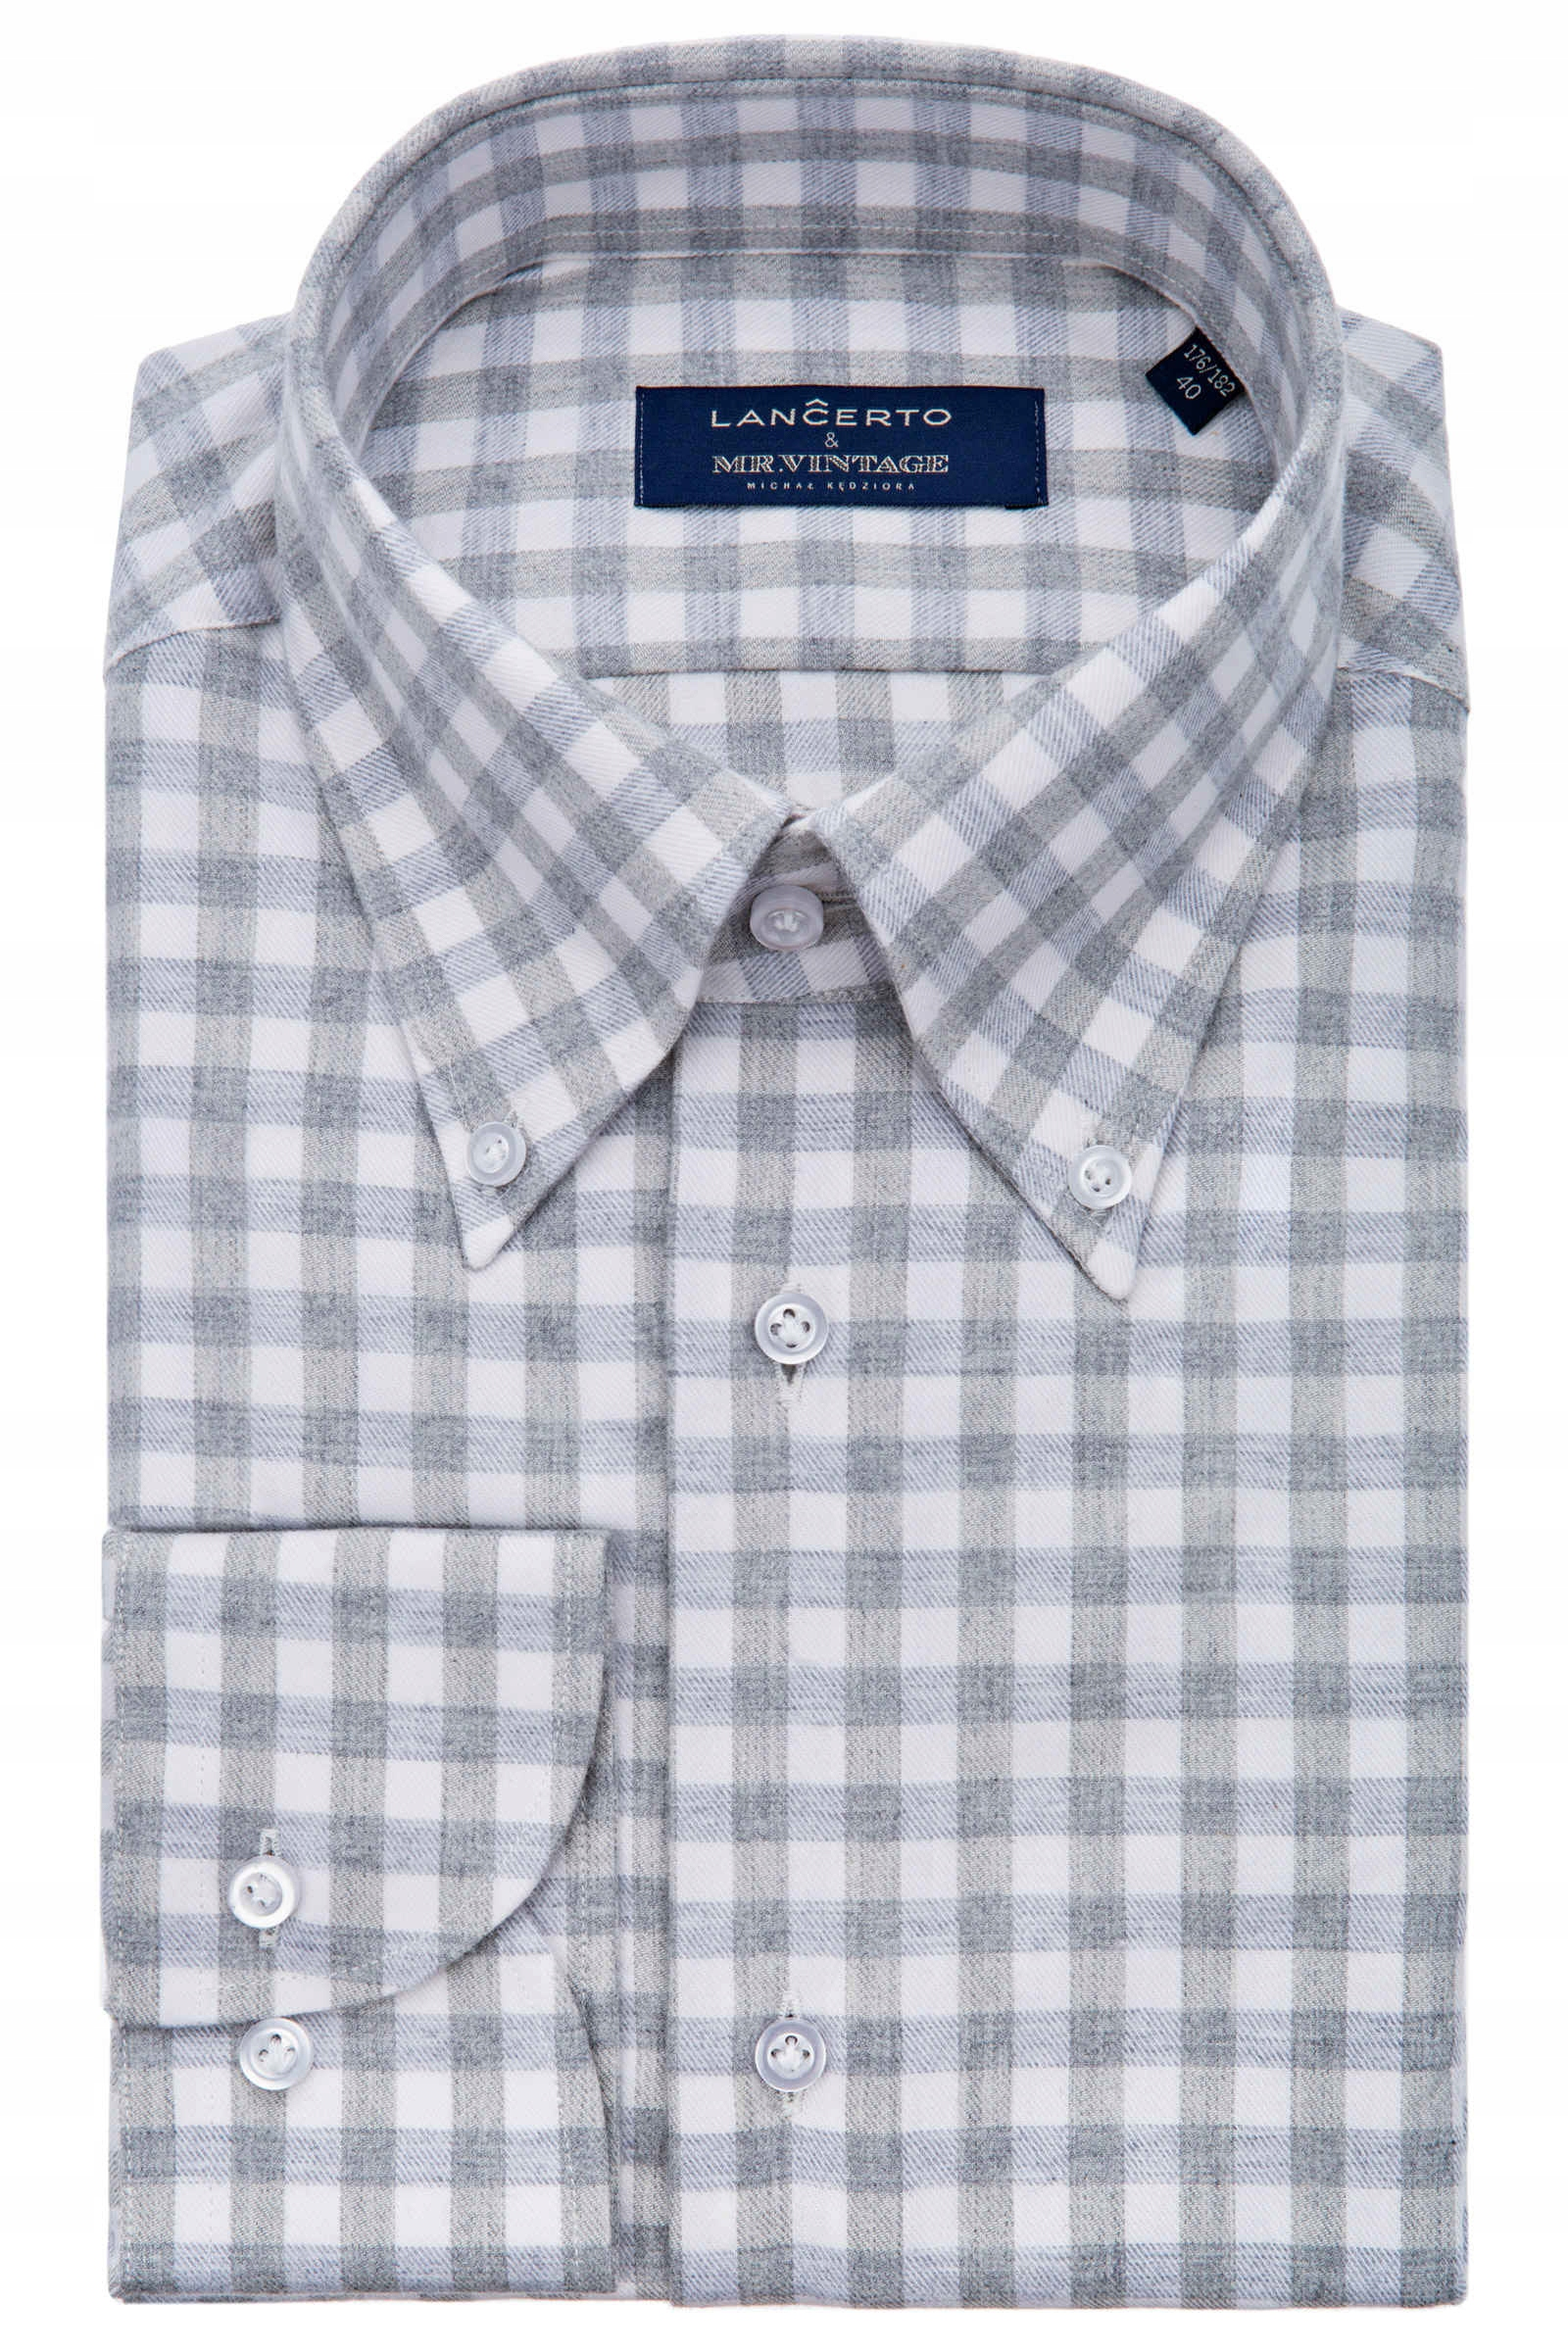 Lancerto tričko&Pán Vintage Medway 176/39